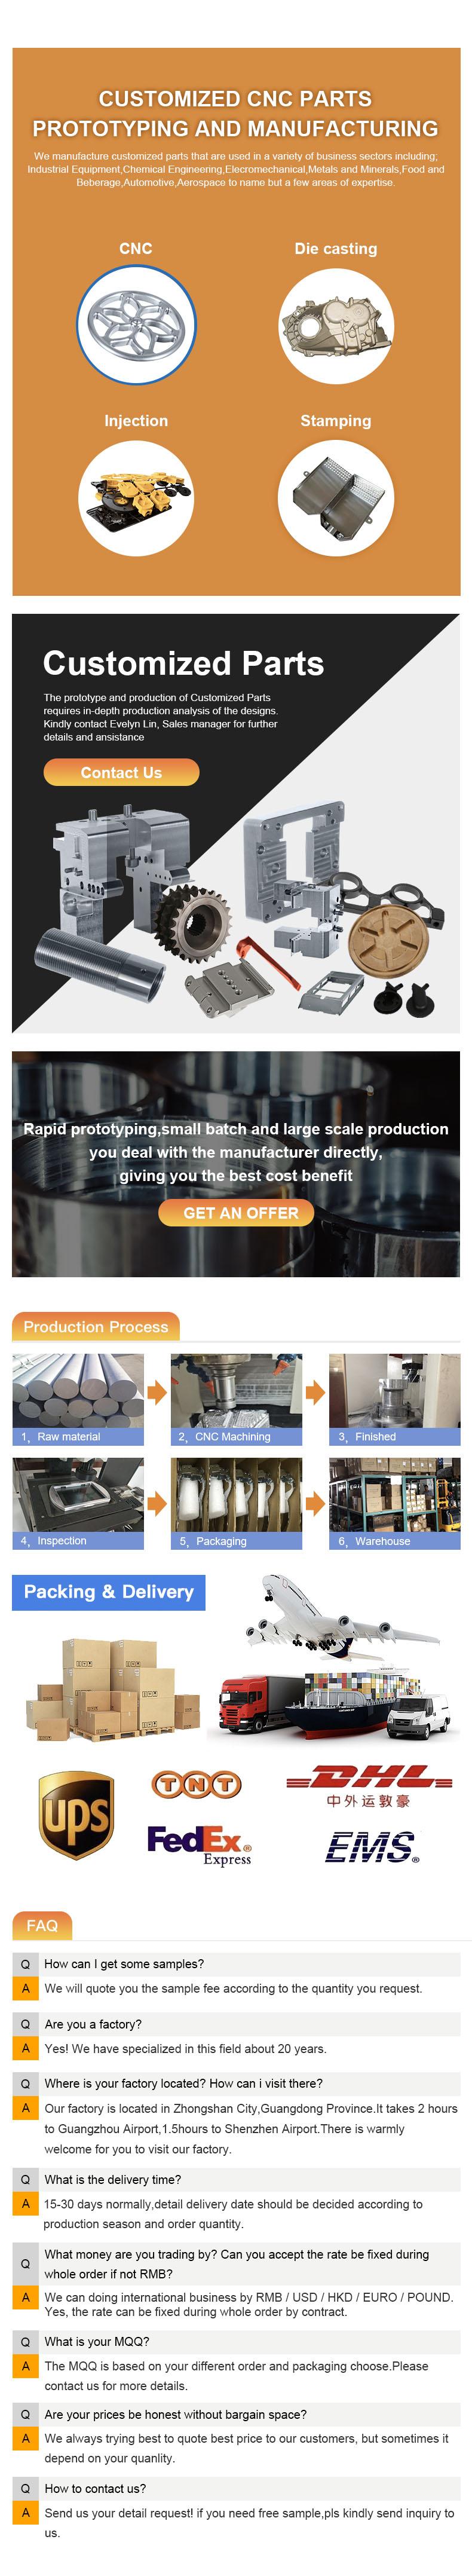 cnc machining part factory